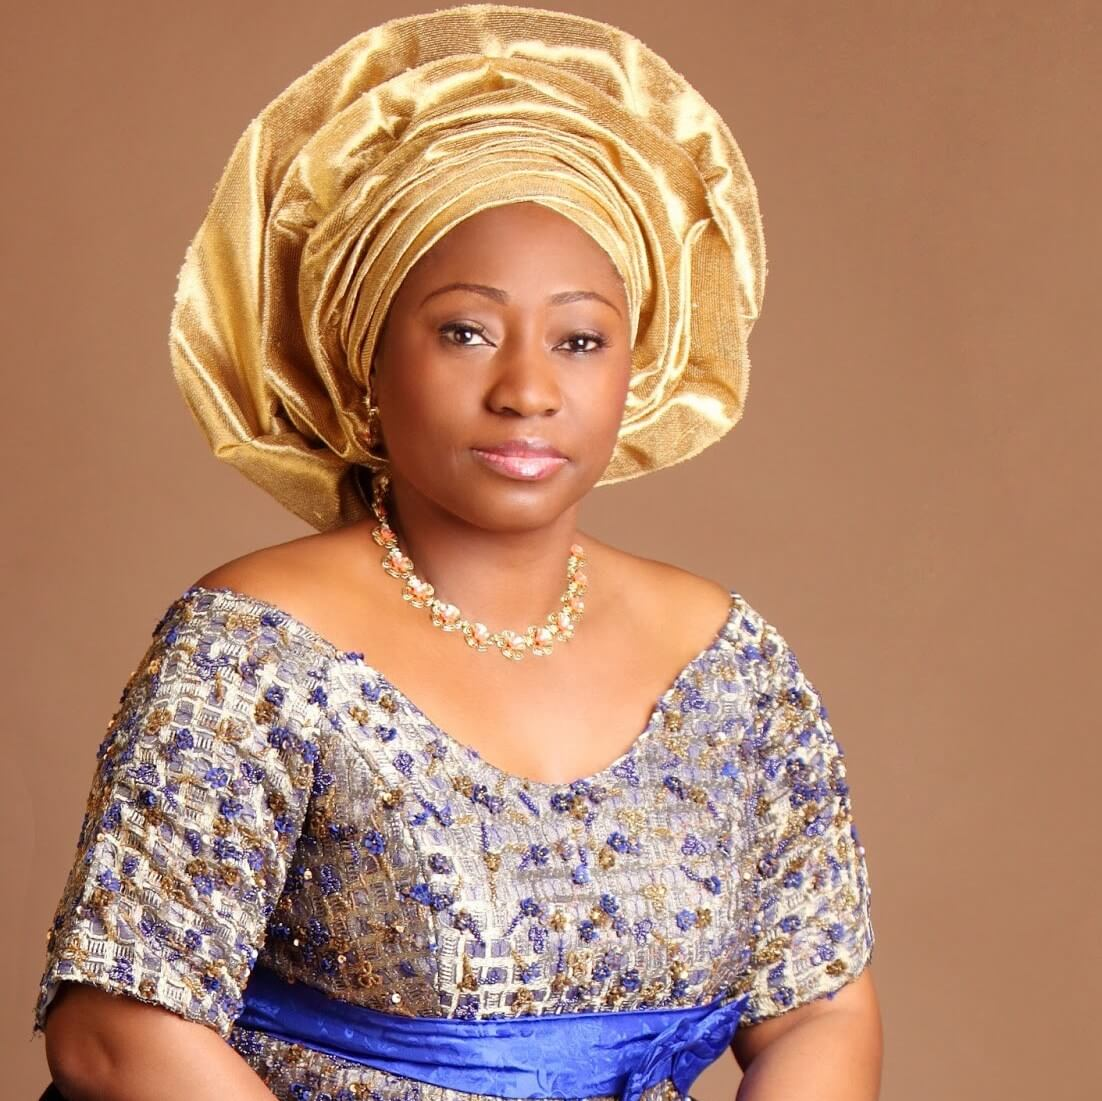 Retain-pregnant-schoolgirls-in-school-Gov-Fayemi's-wife